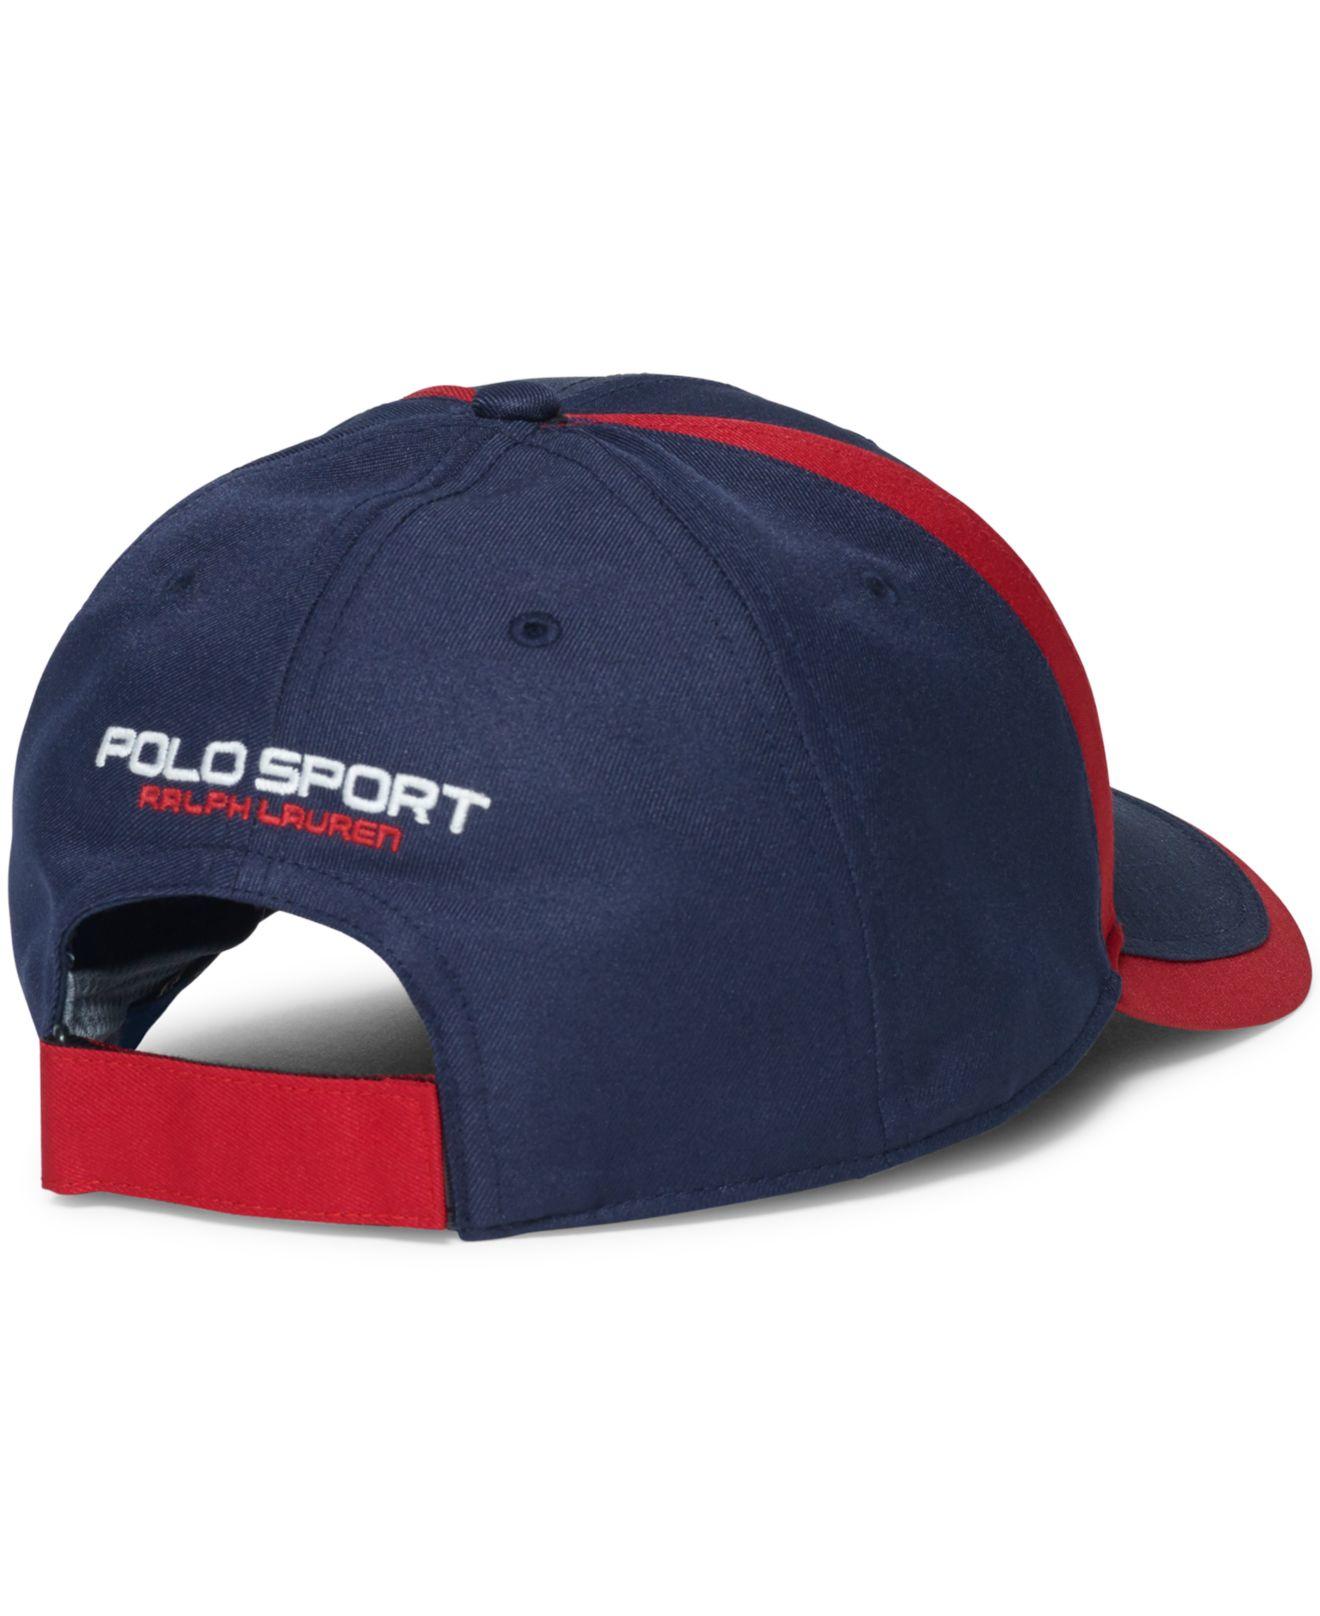 3e0fe833 Polo Ralph Lauren Polo Sport Usa Baseline Hat in Blue for Men - Lyst